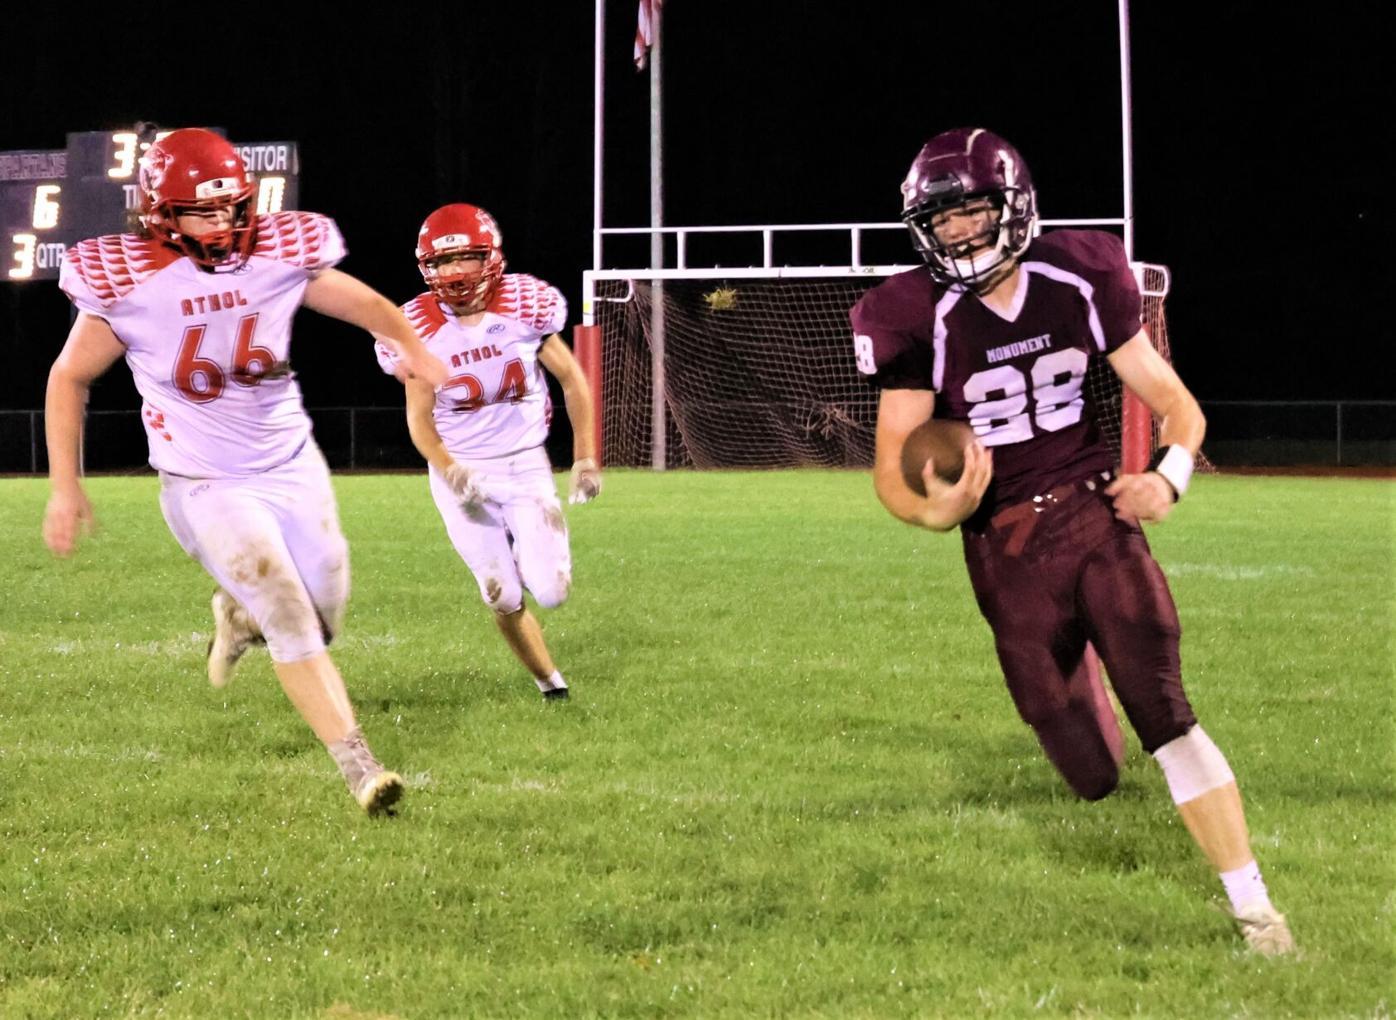 nick henderson runs the ball